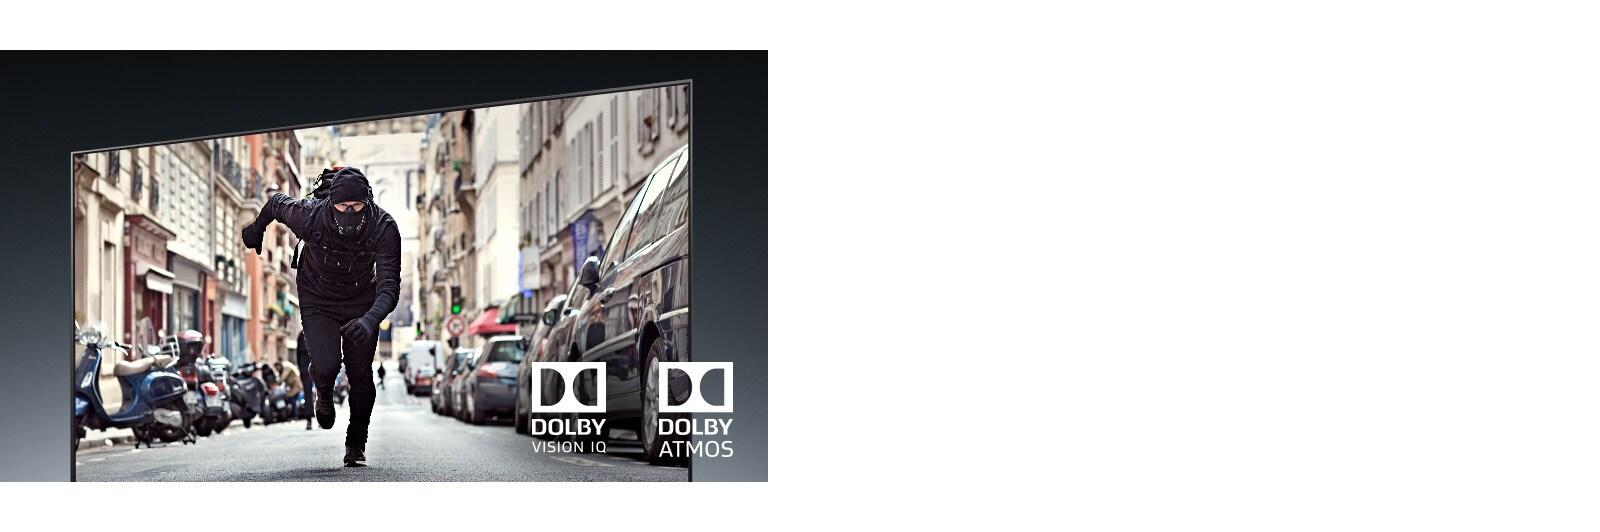 LG OLED65BXPTA Dolby Vision IQ and Atmos